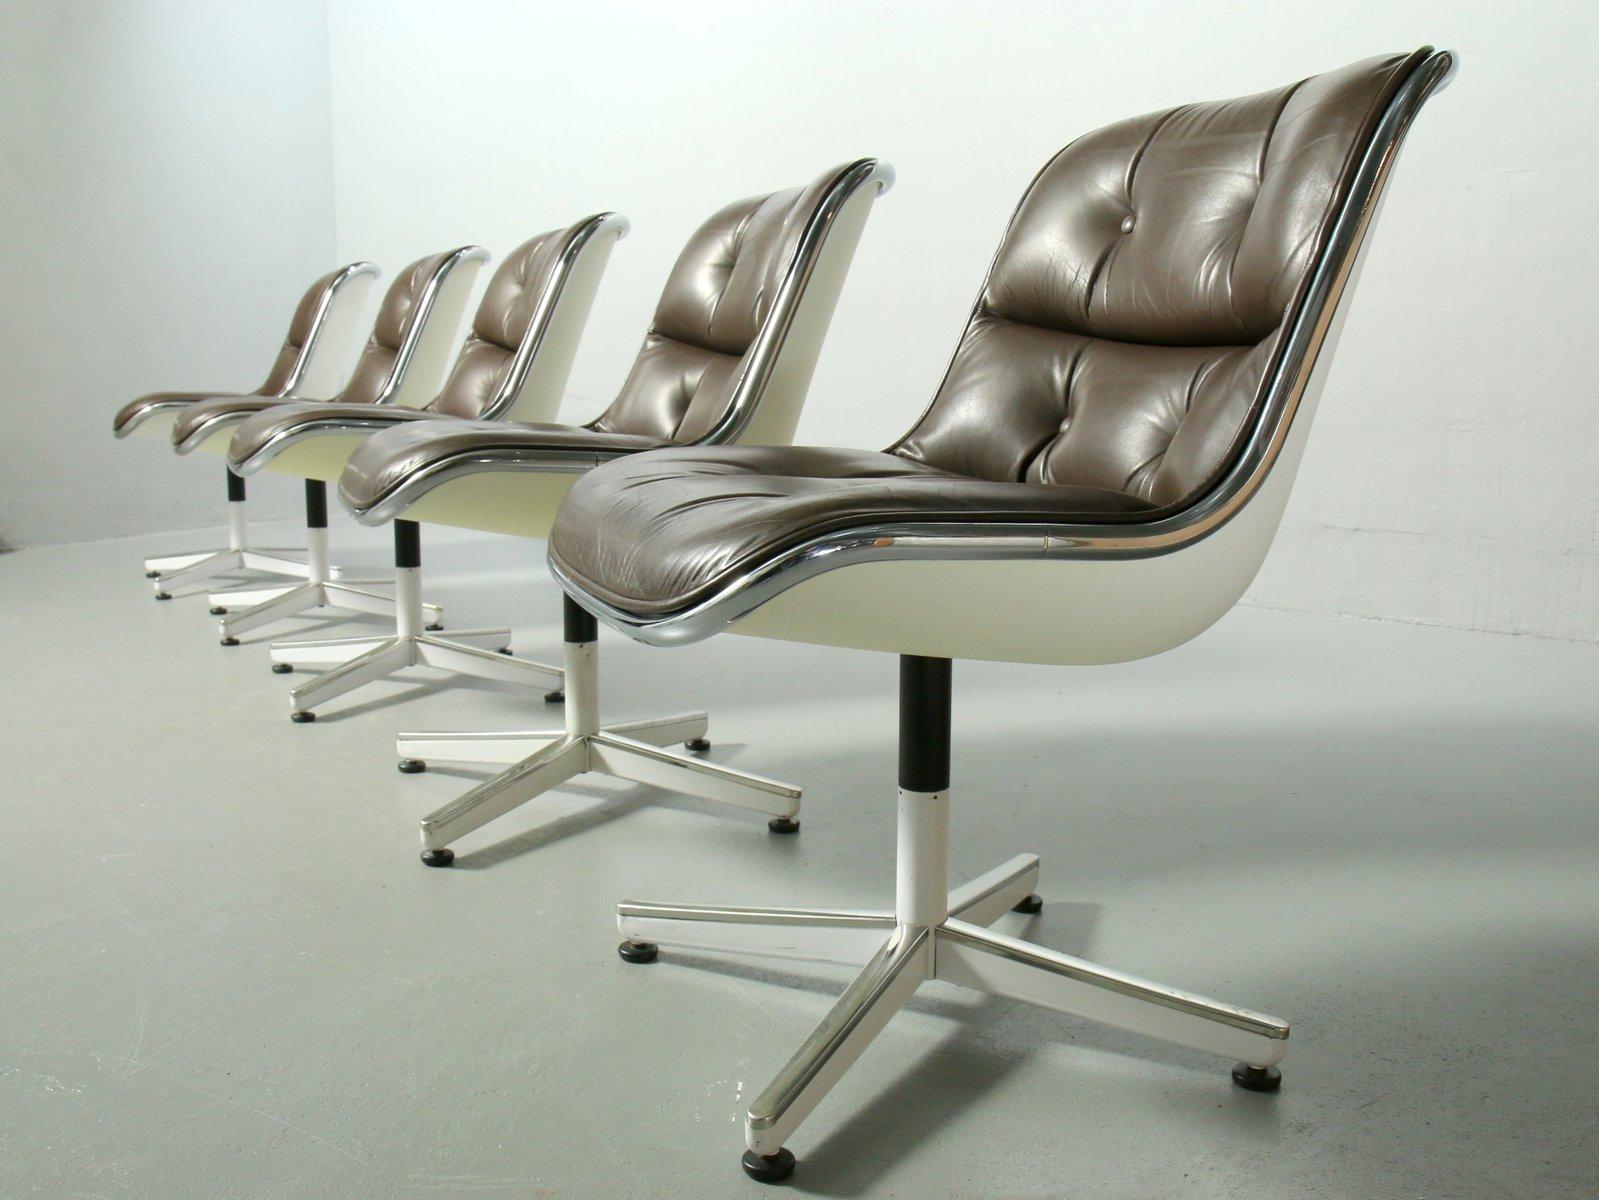 executive stuhl von charles pollock f r knoll international 1970er bei pamono kaufen. Black Bedroom Furniture Sets. Home Design Ideas